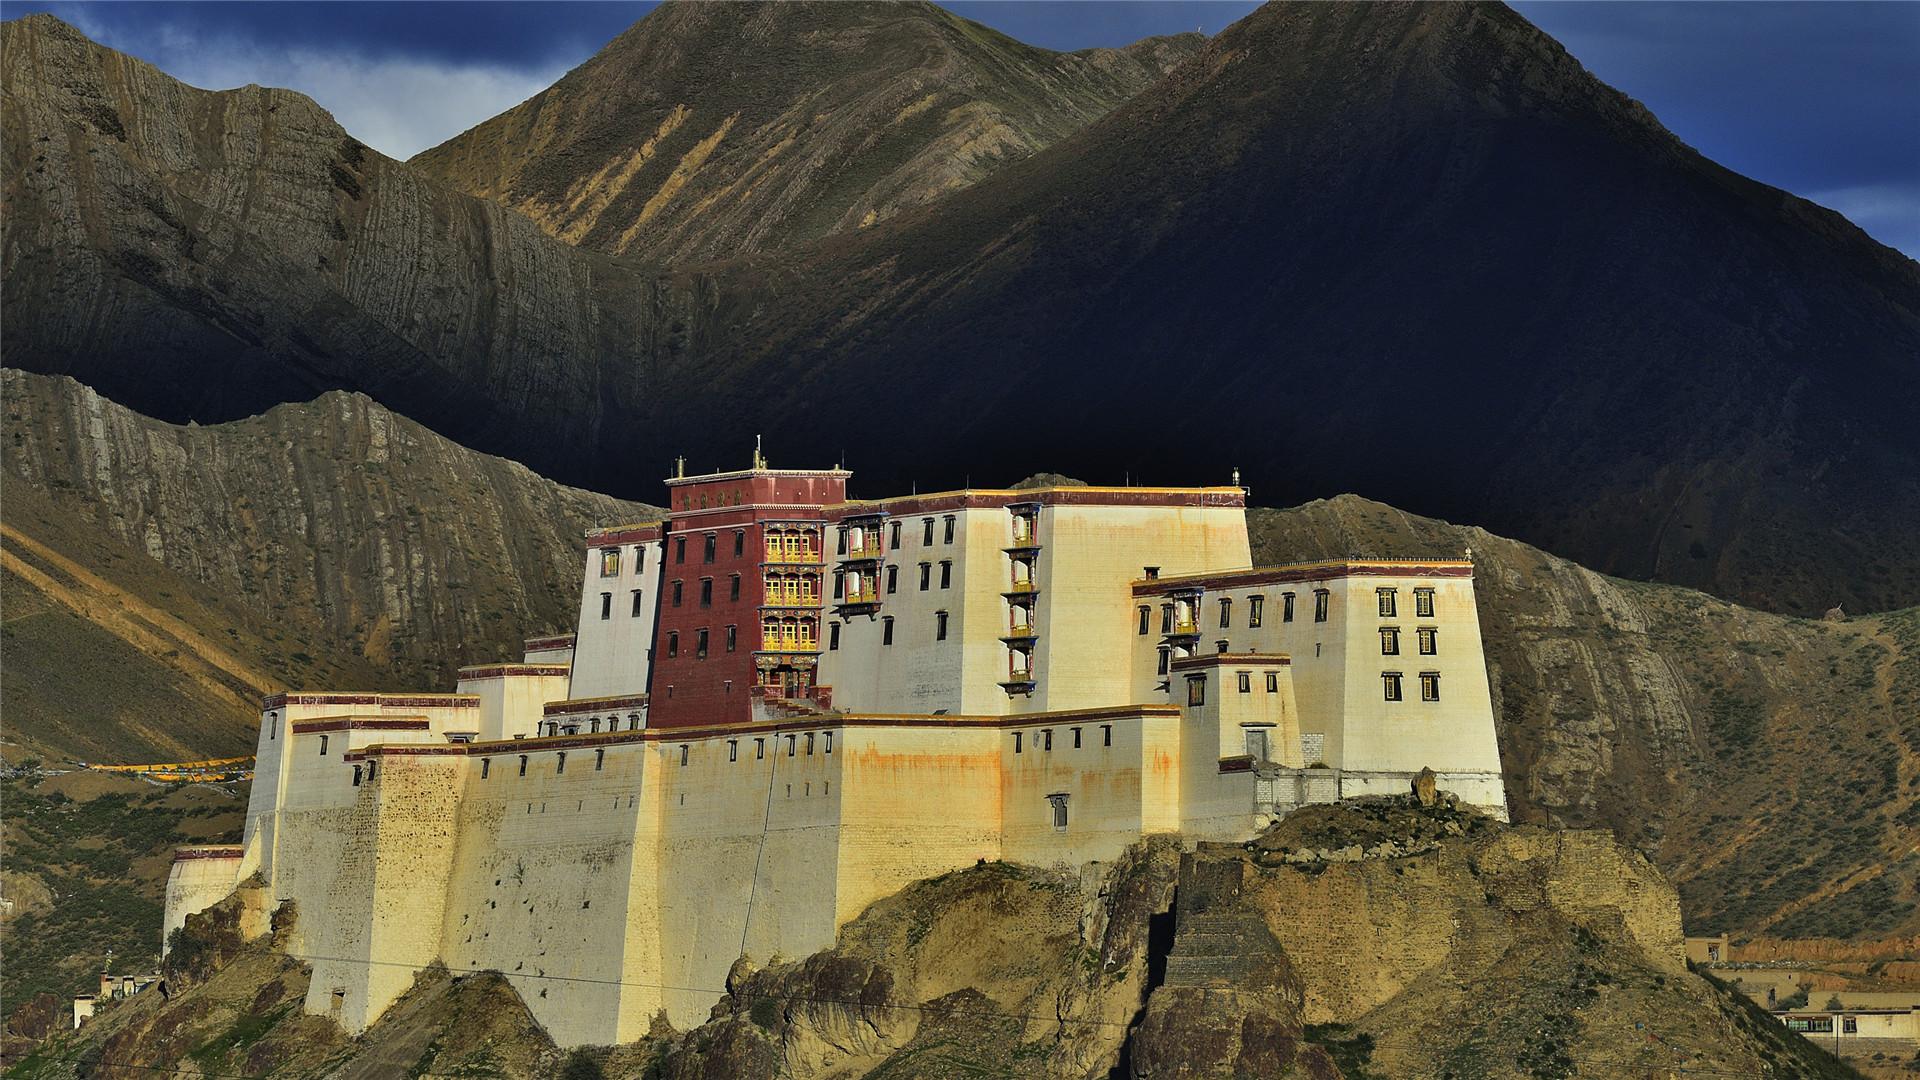 Popular cities tour- Lhasa-Gyantse-Shigatse Tour-06 days